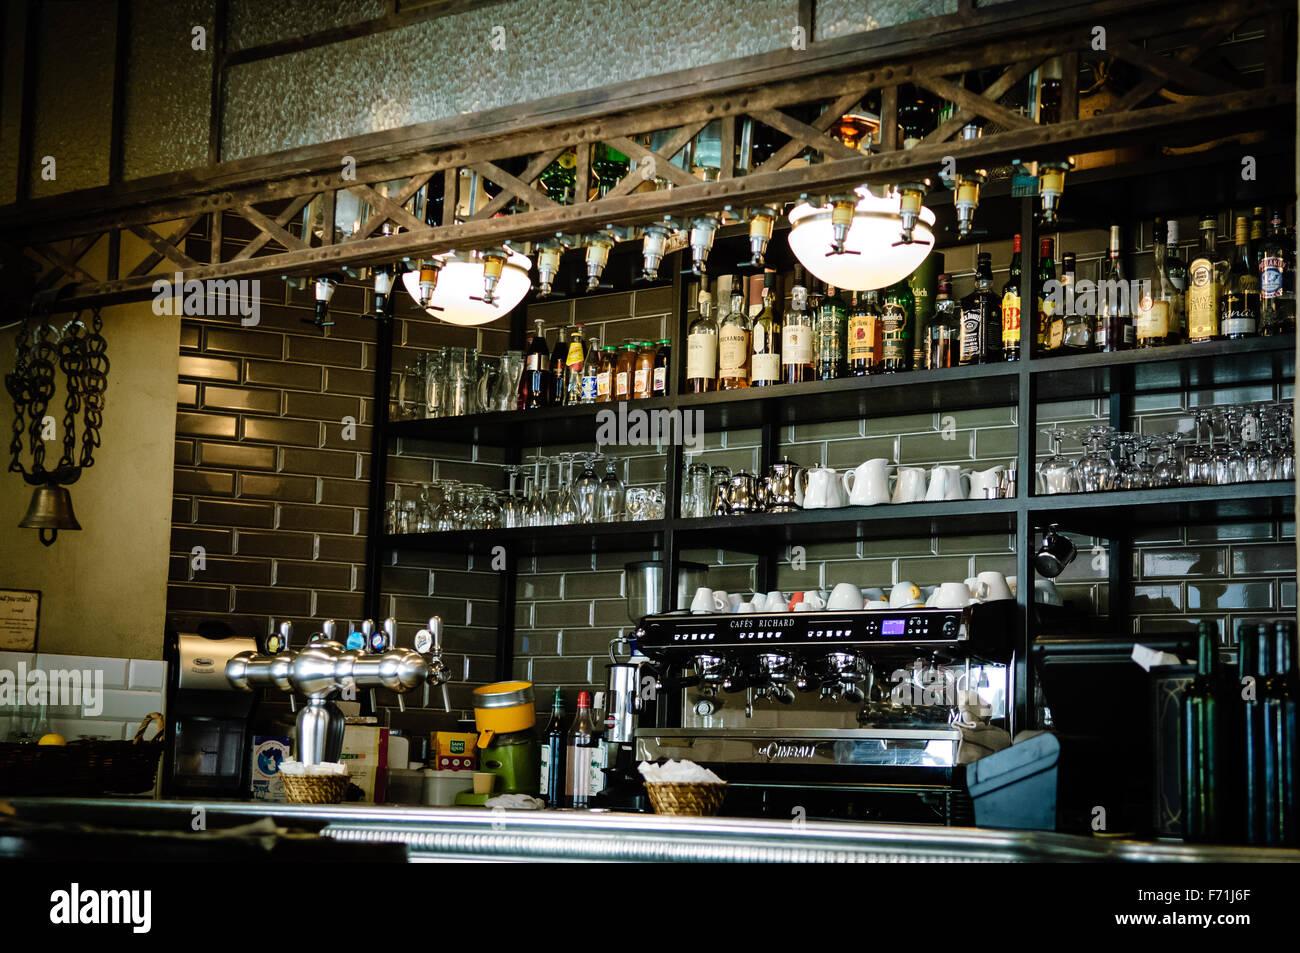 a coffee shop bar in paris france stock photo 90390679 alamy. Black Bedroom Furniture Sets. Home Design Ideas